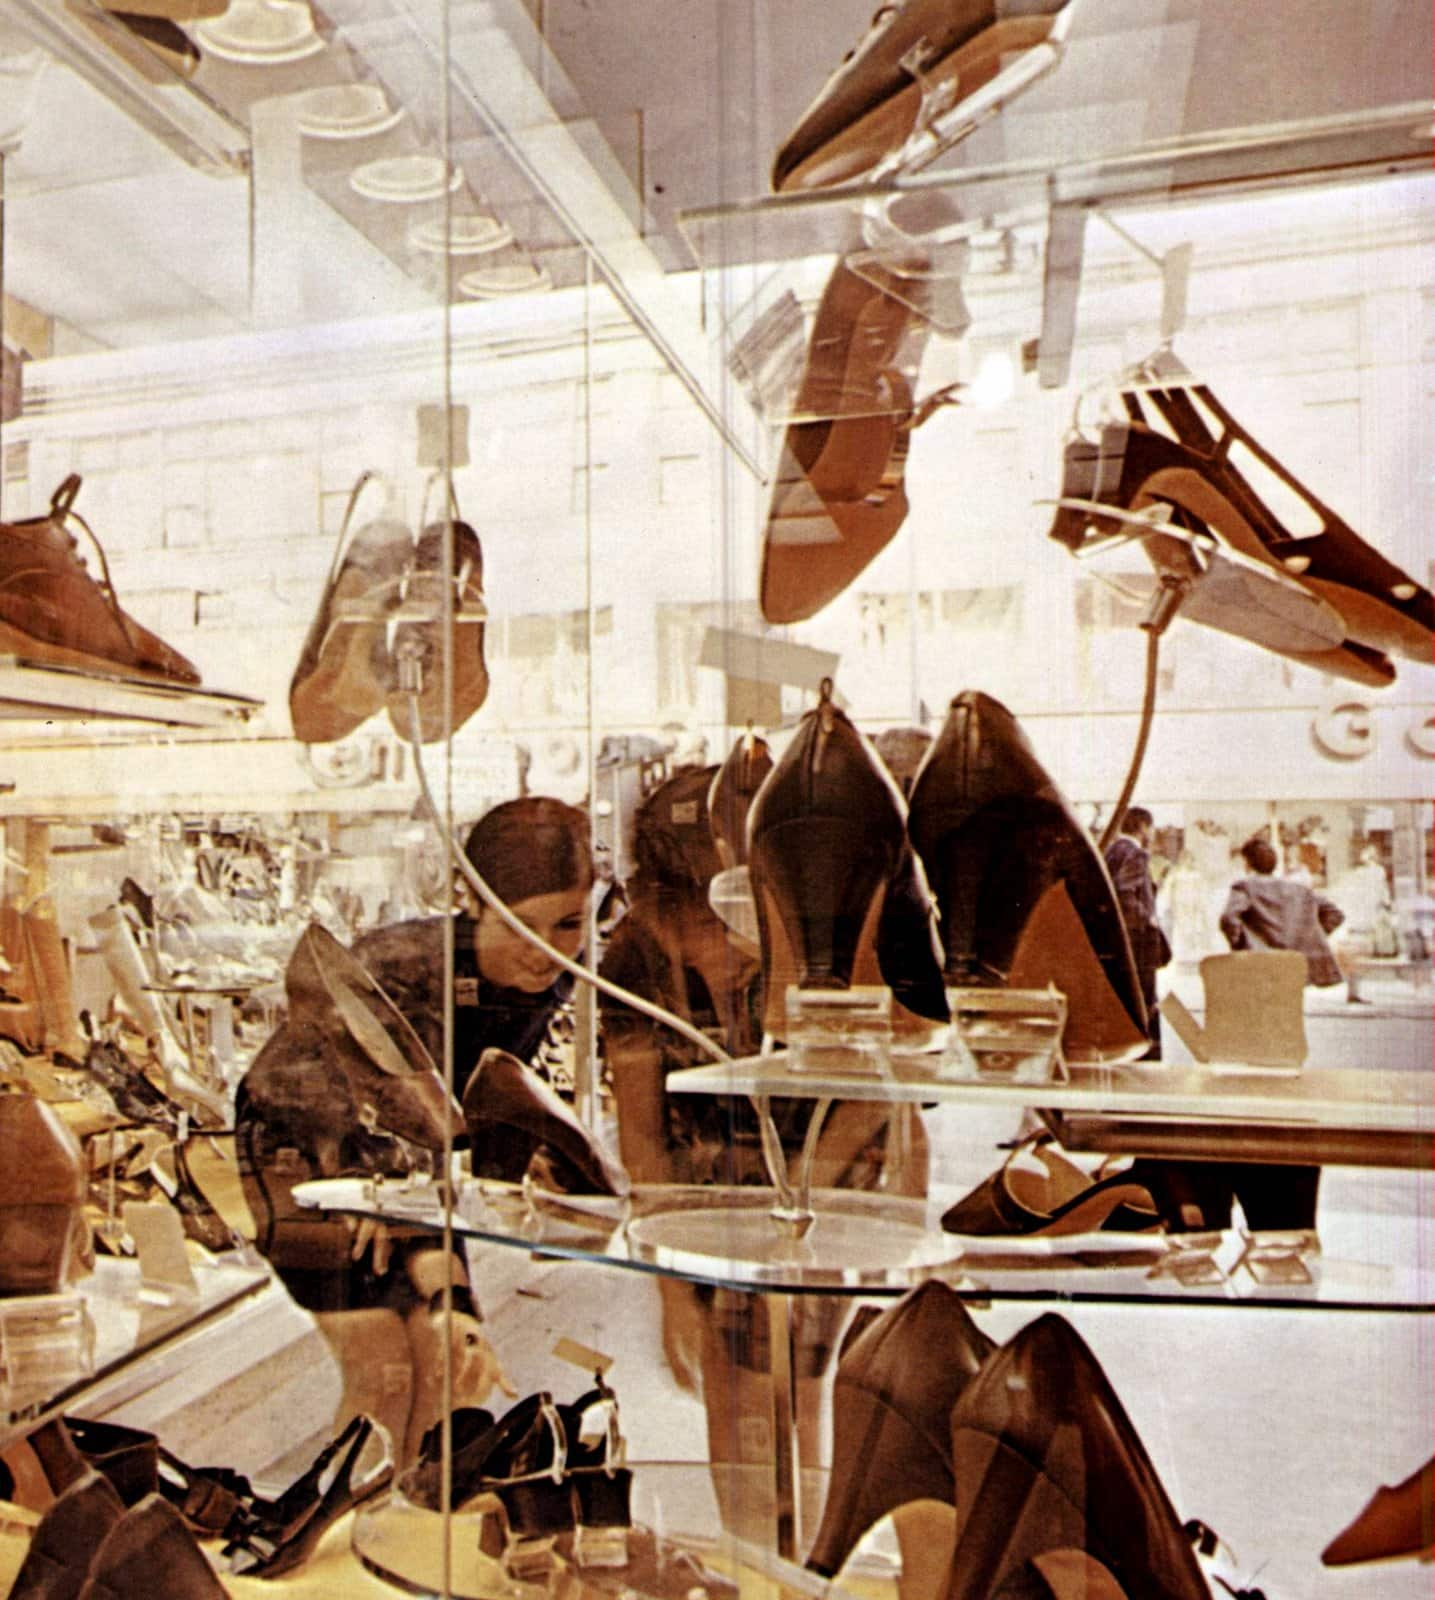 Vintage sixties women's casual shoe display (1967)